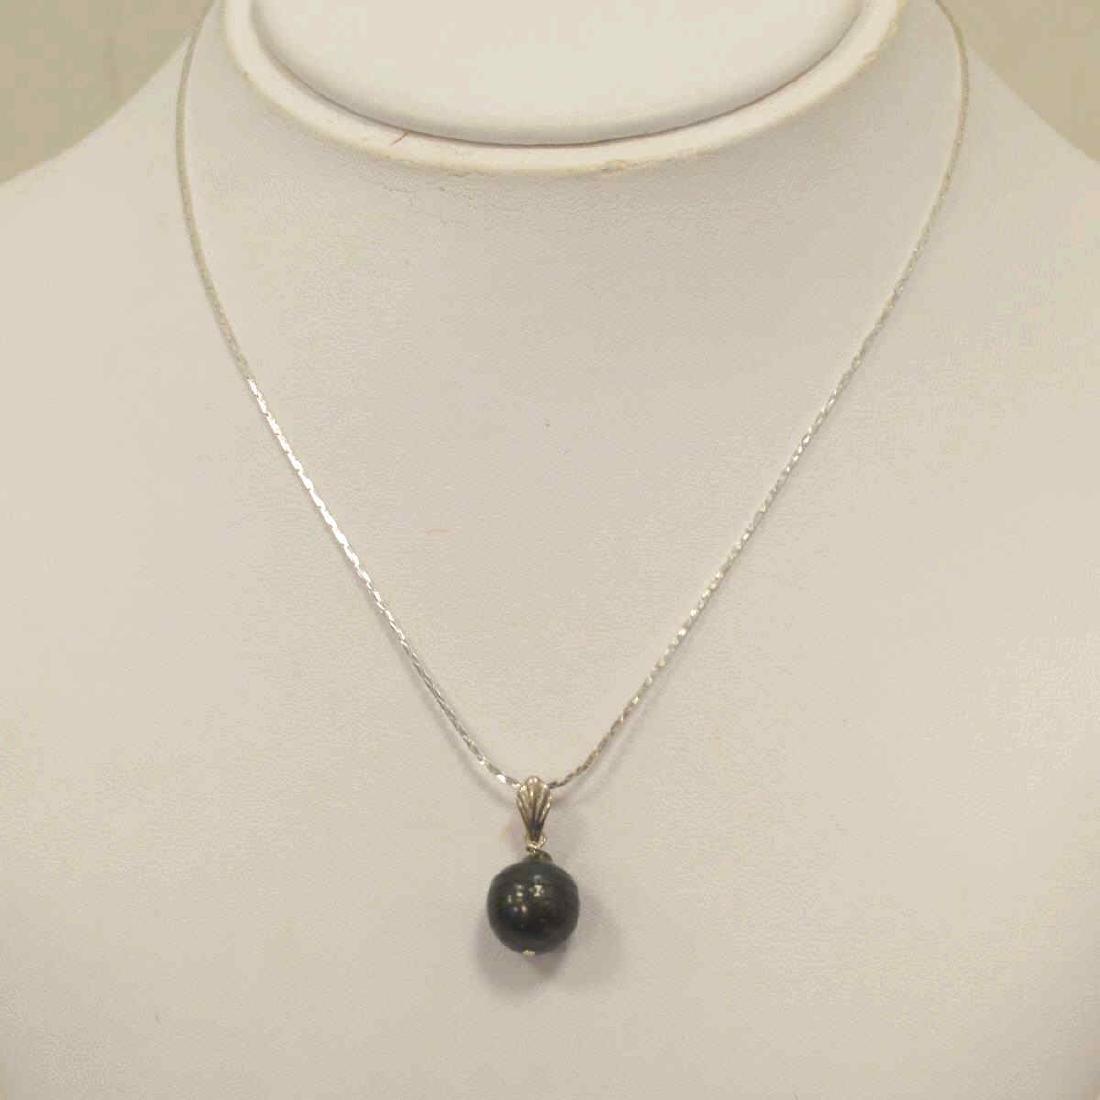 Sterling Silver Black South Sea Pearl Pendant